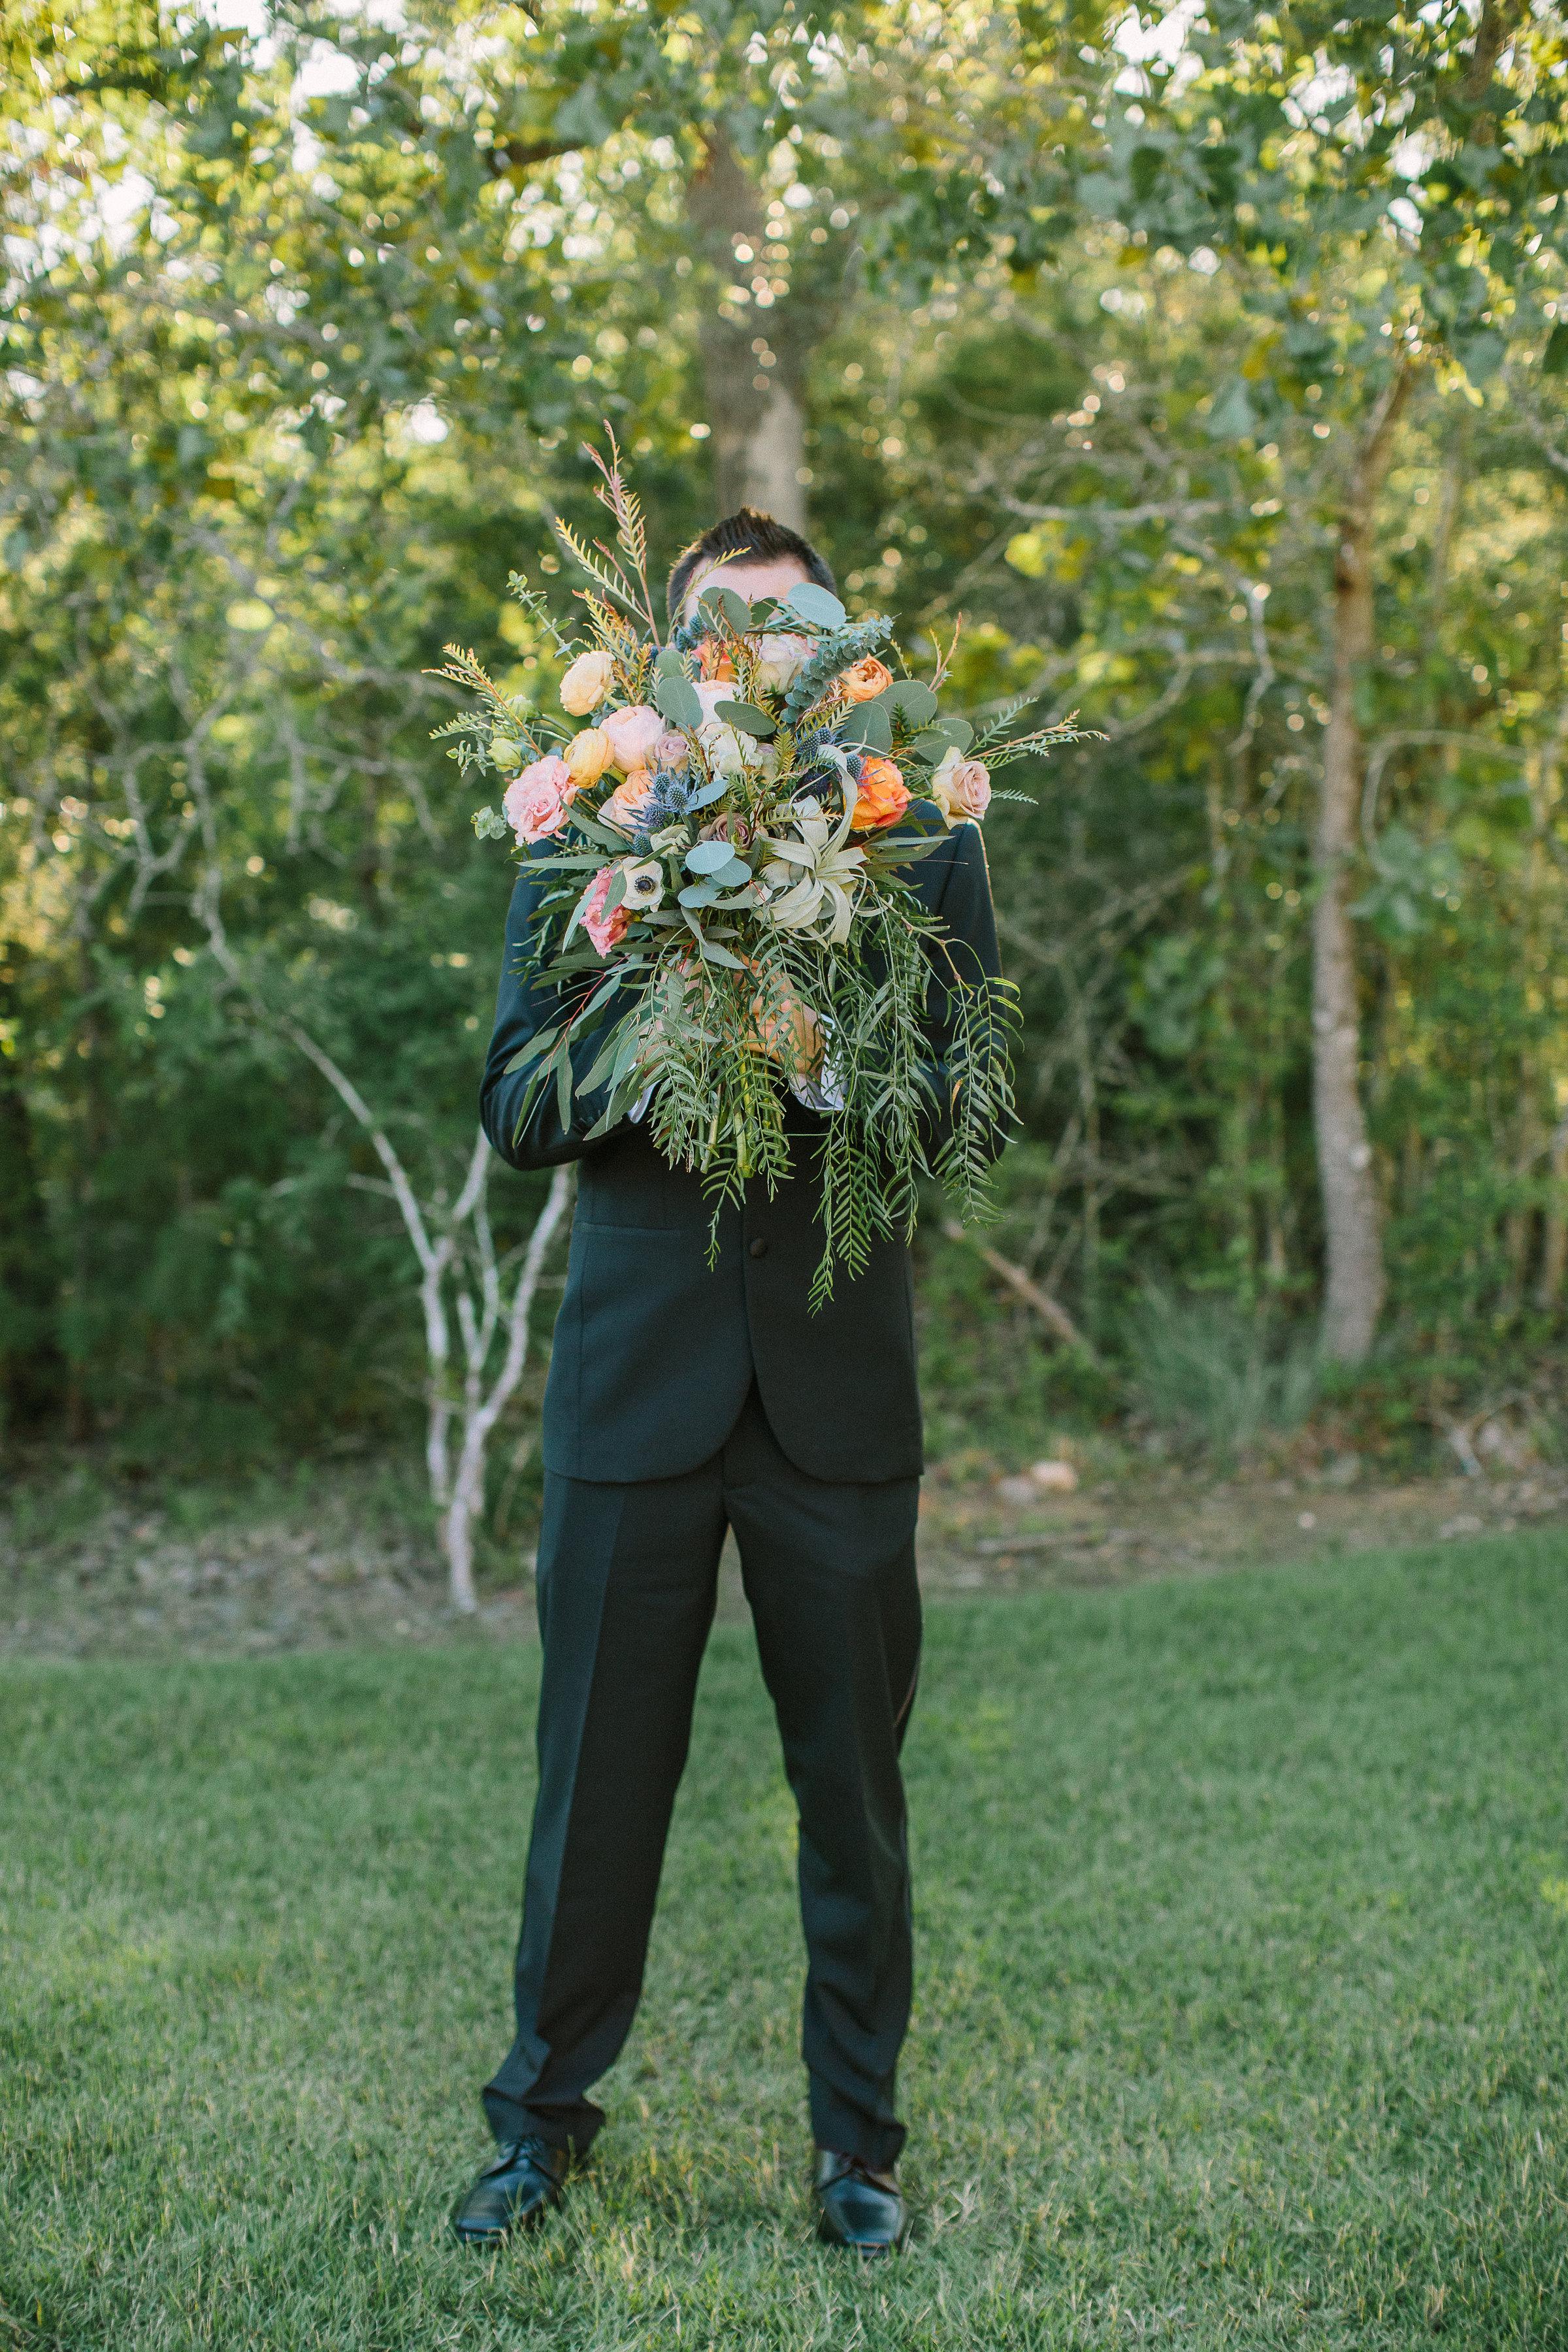 Ellen-Ashton-Photography-Peach-Creek-Ranch-Weddings-Wed-and-Prosper197